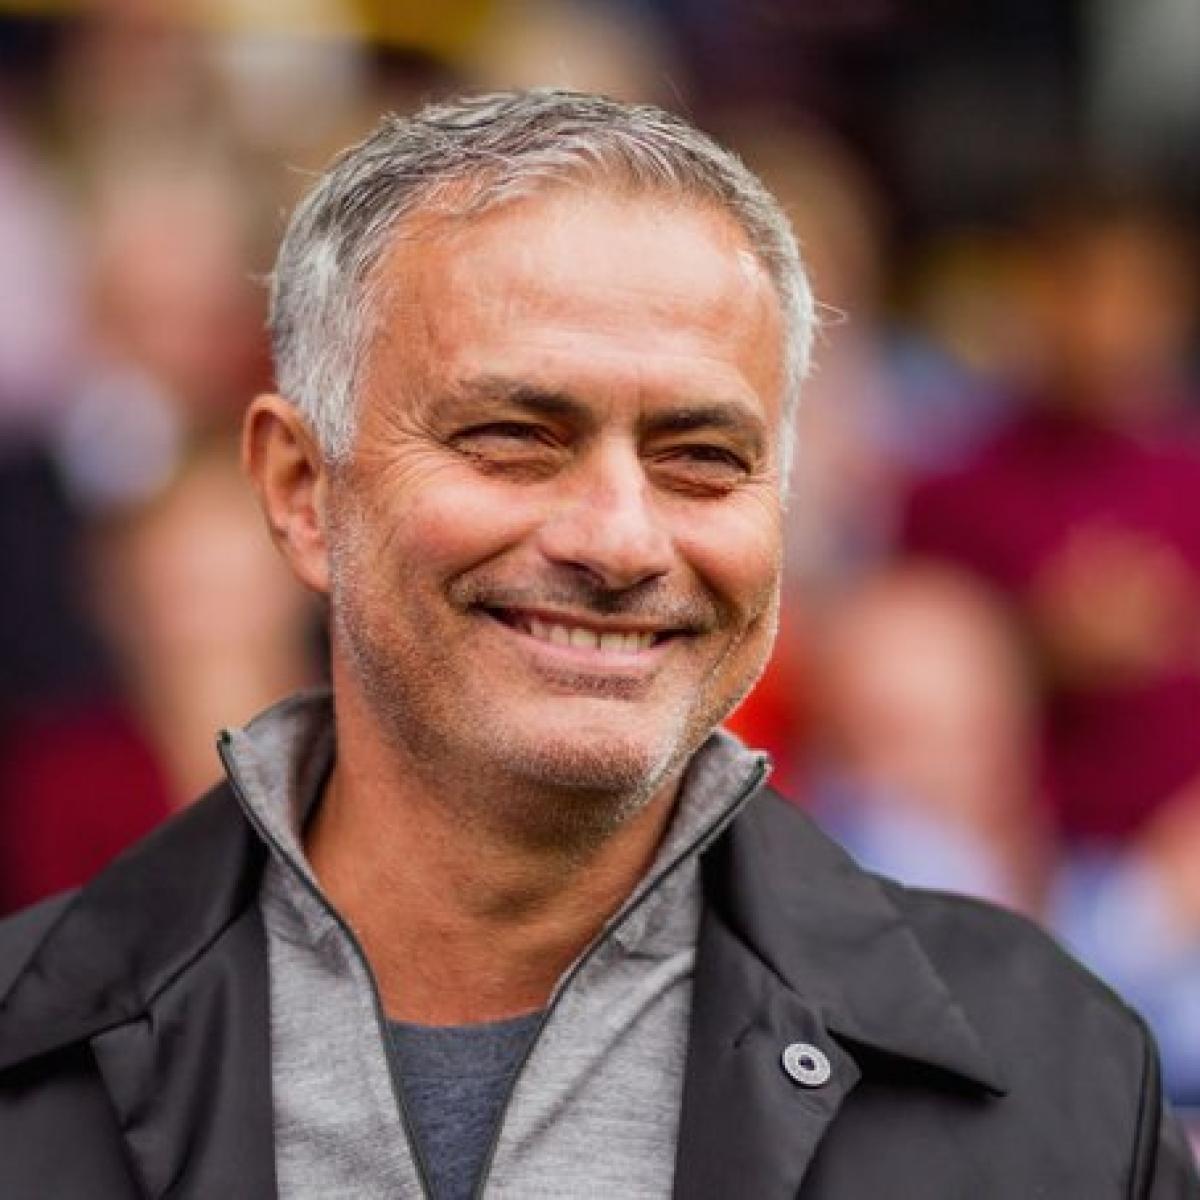 Neither Cristiano Ronaldo nor Lionel Messi: Jose Mourinho picks his all-time G.O.A.T